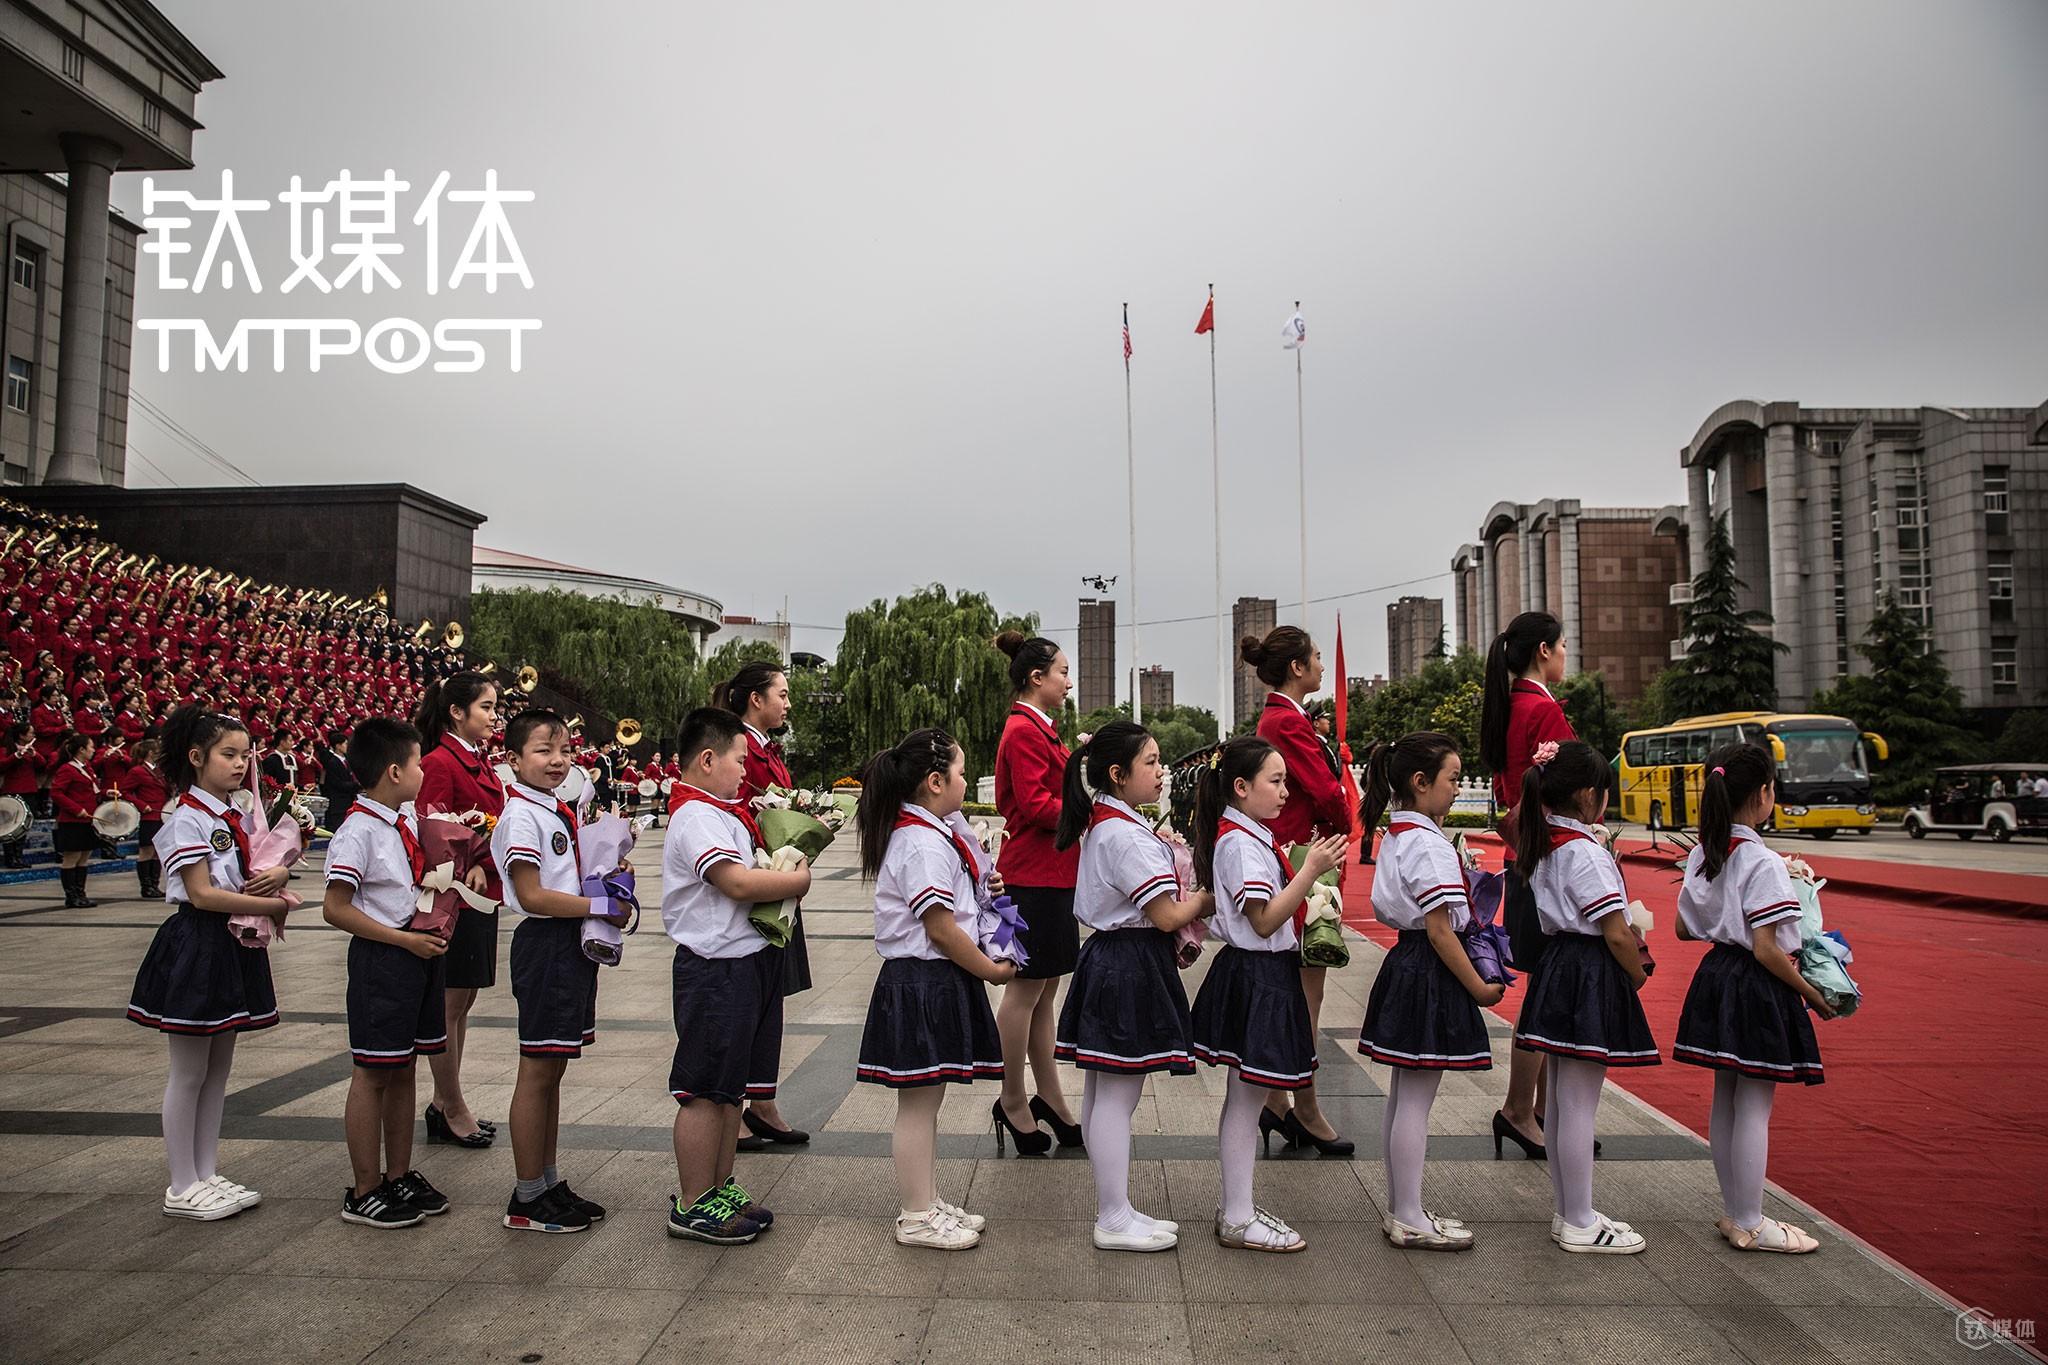 The welcome ceremony at Sias International University of Zhengzhou University